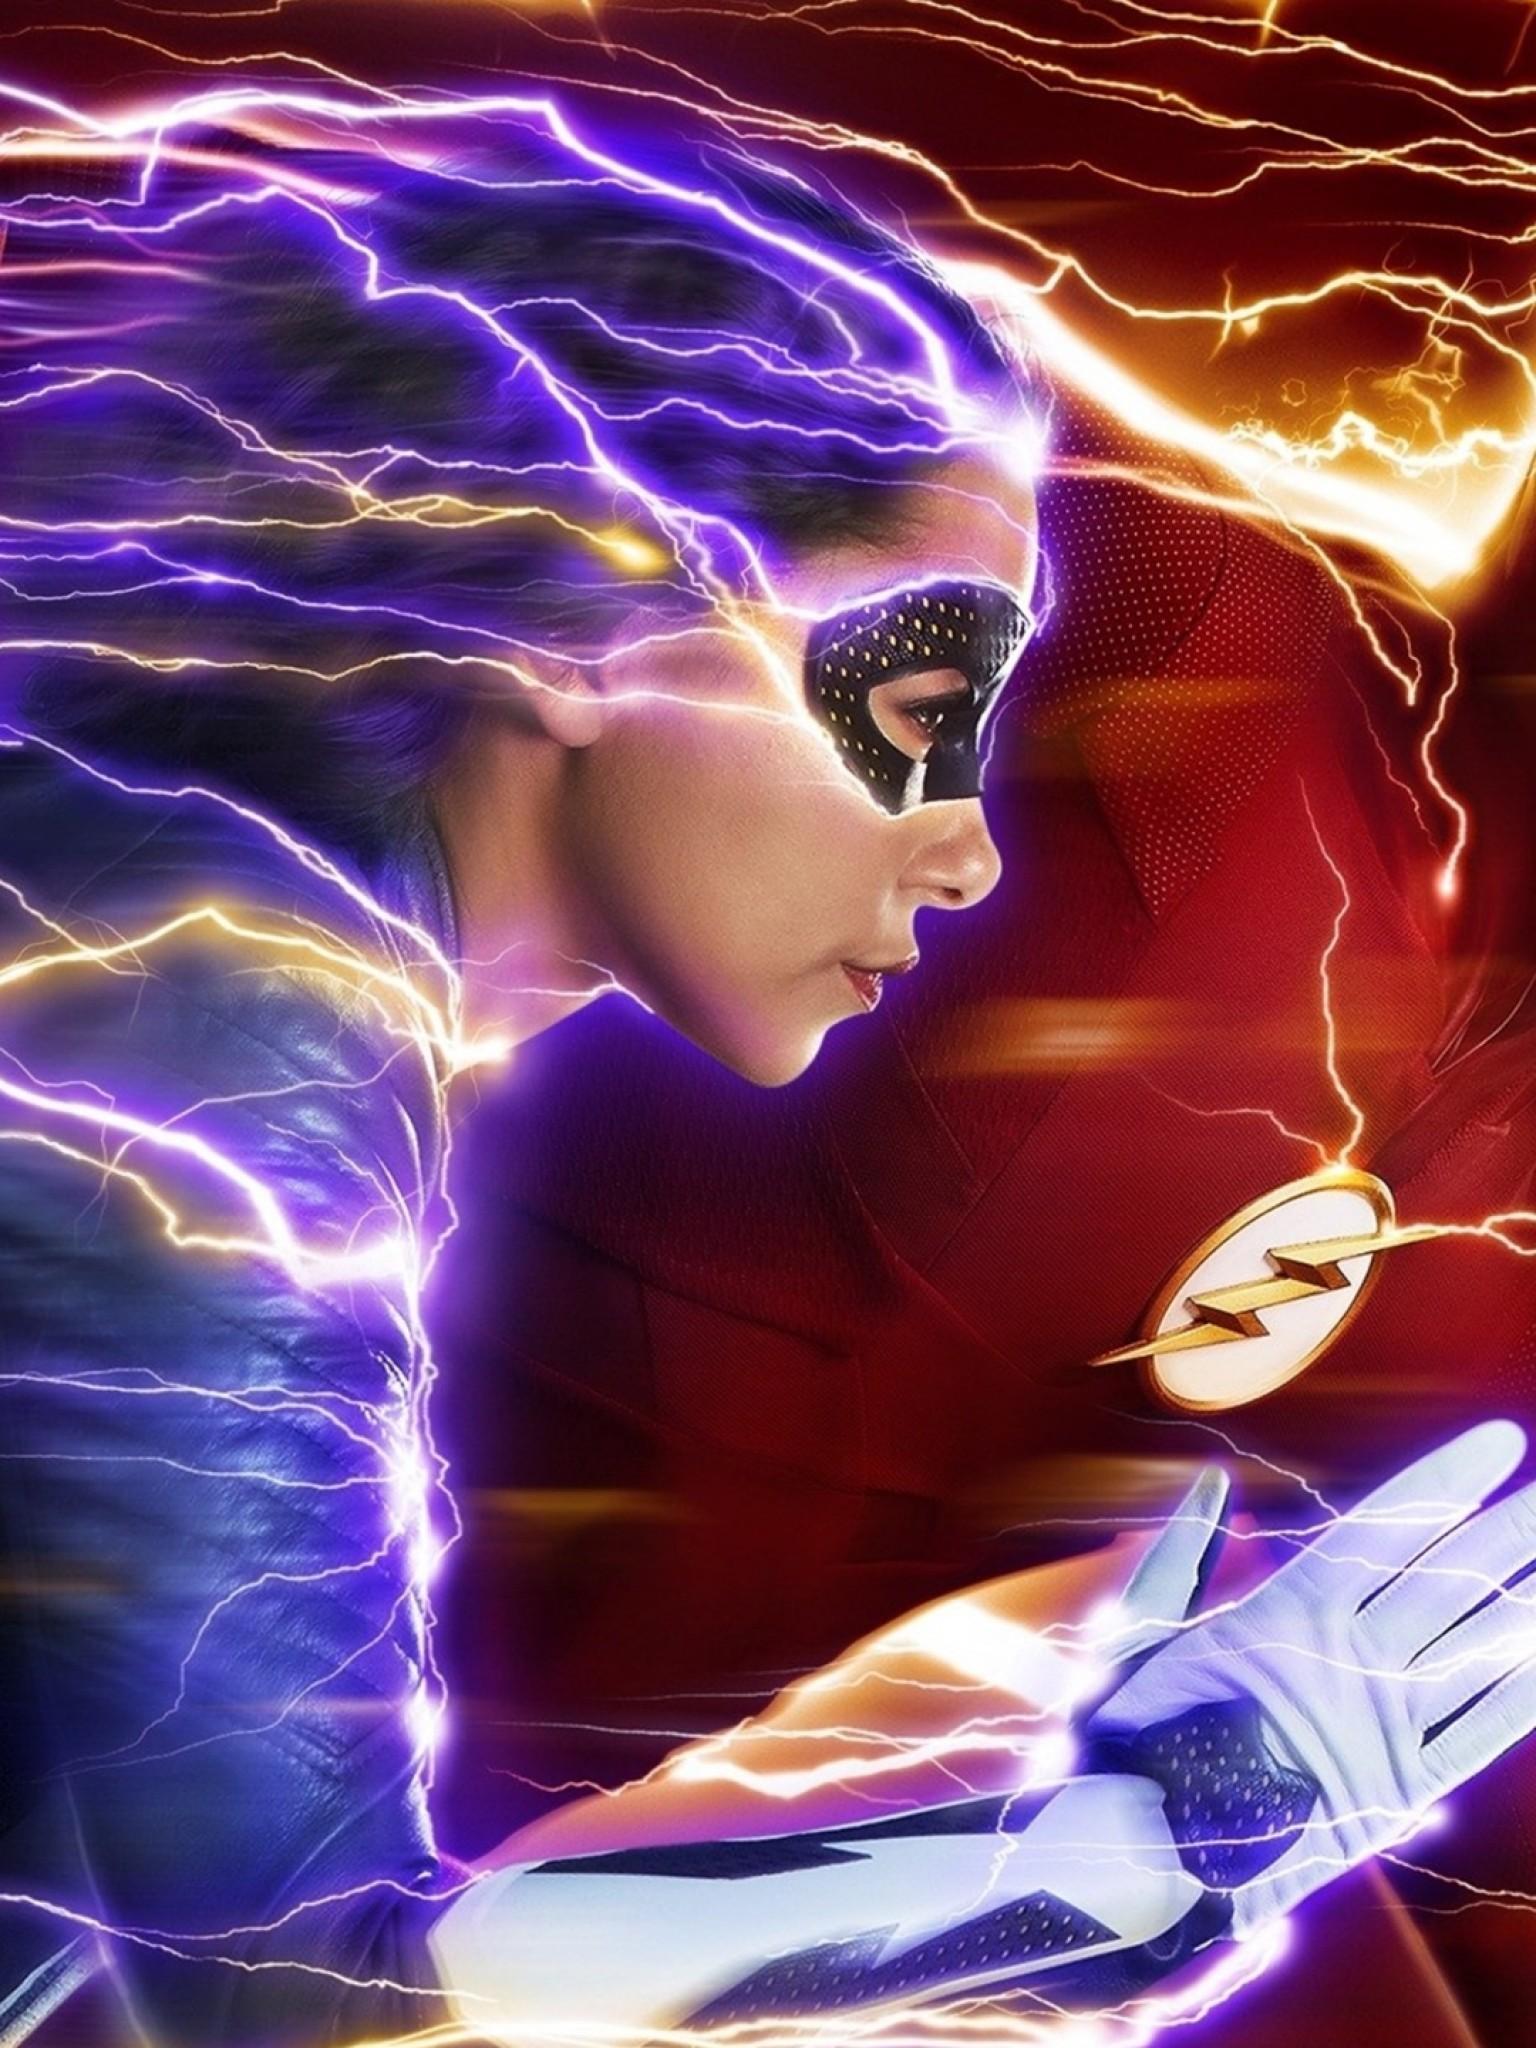 The Flash Season 4 Wallpapers - Wallpaper Cave